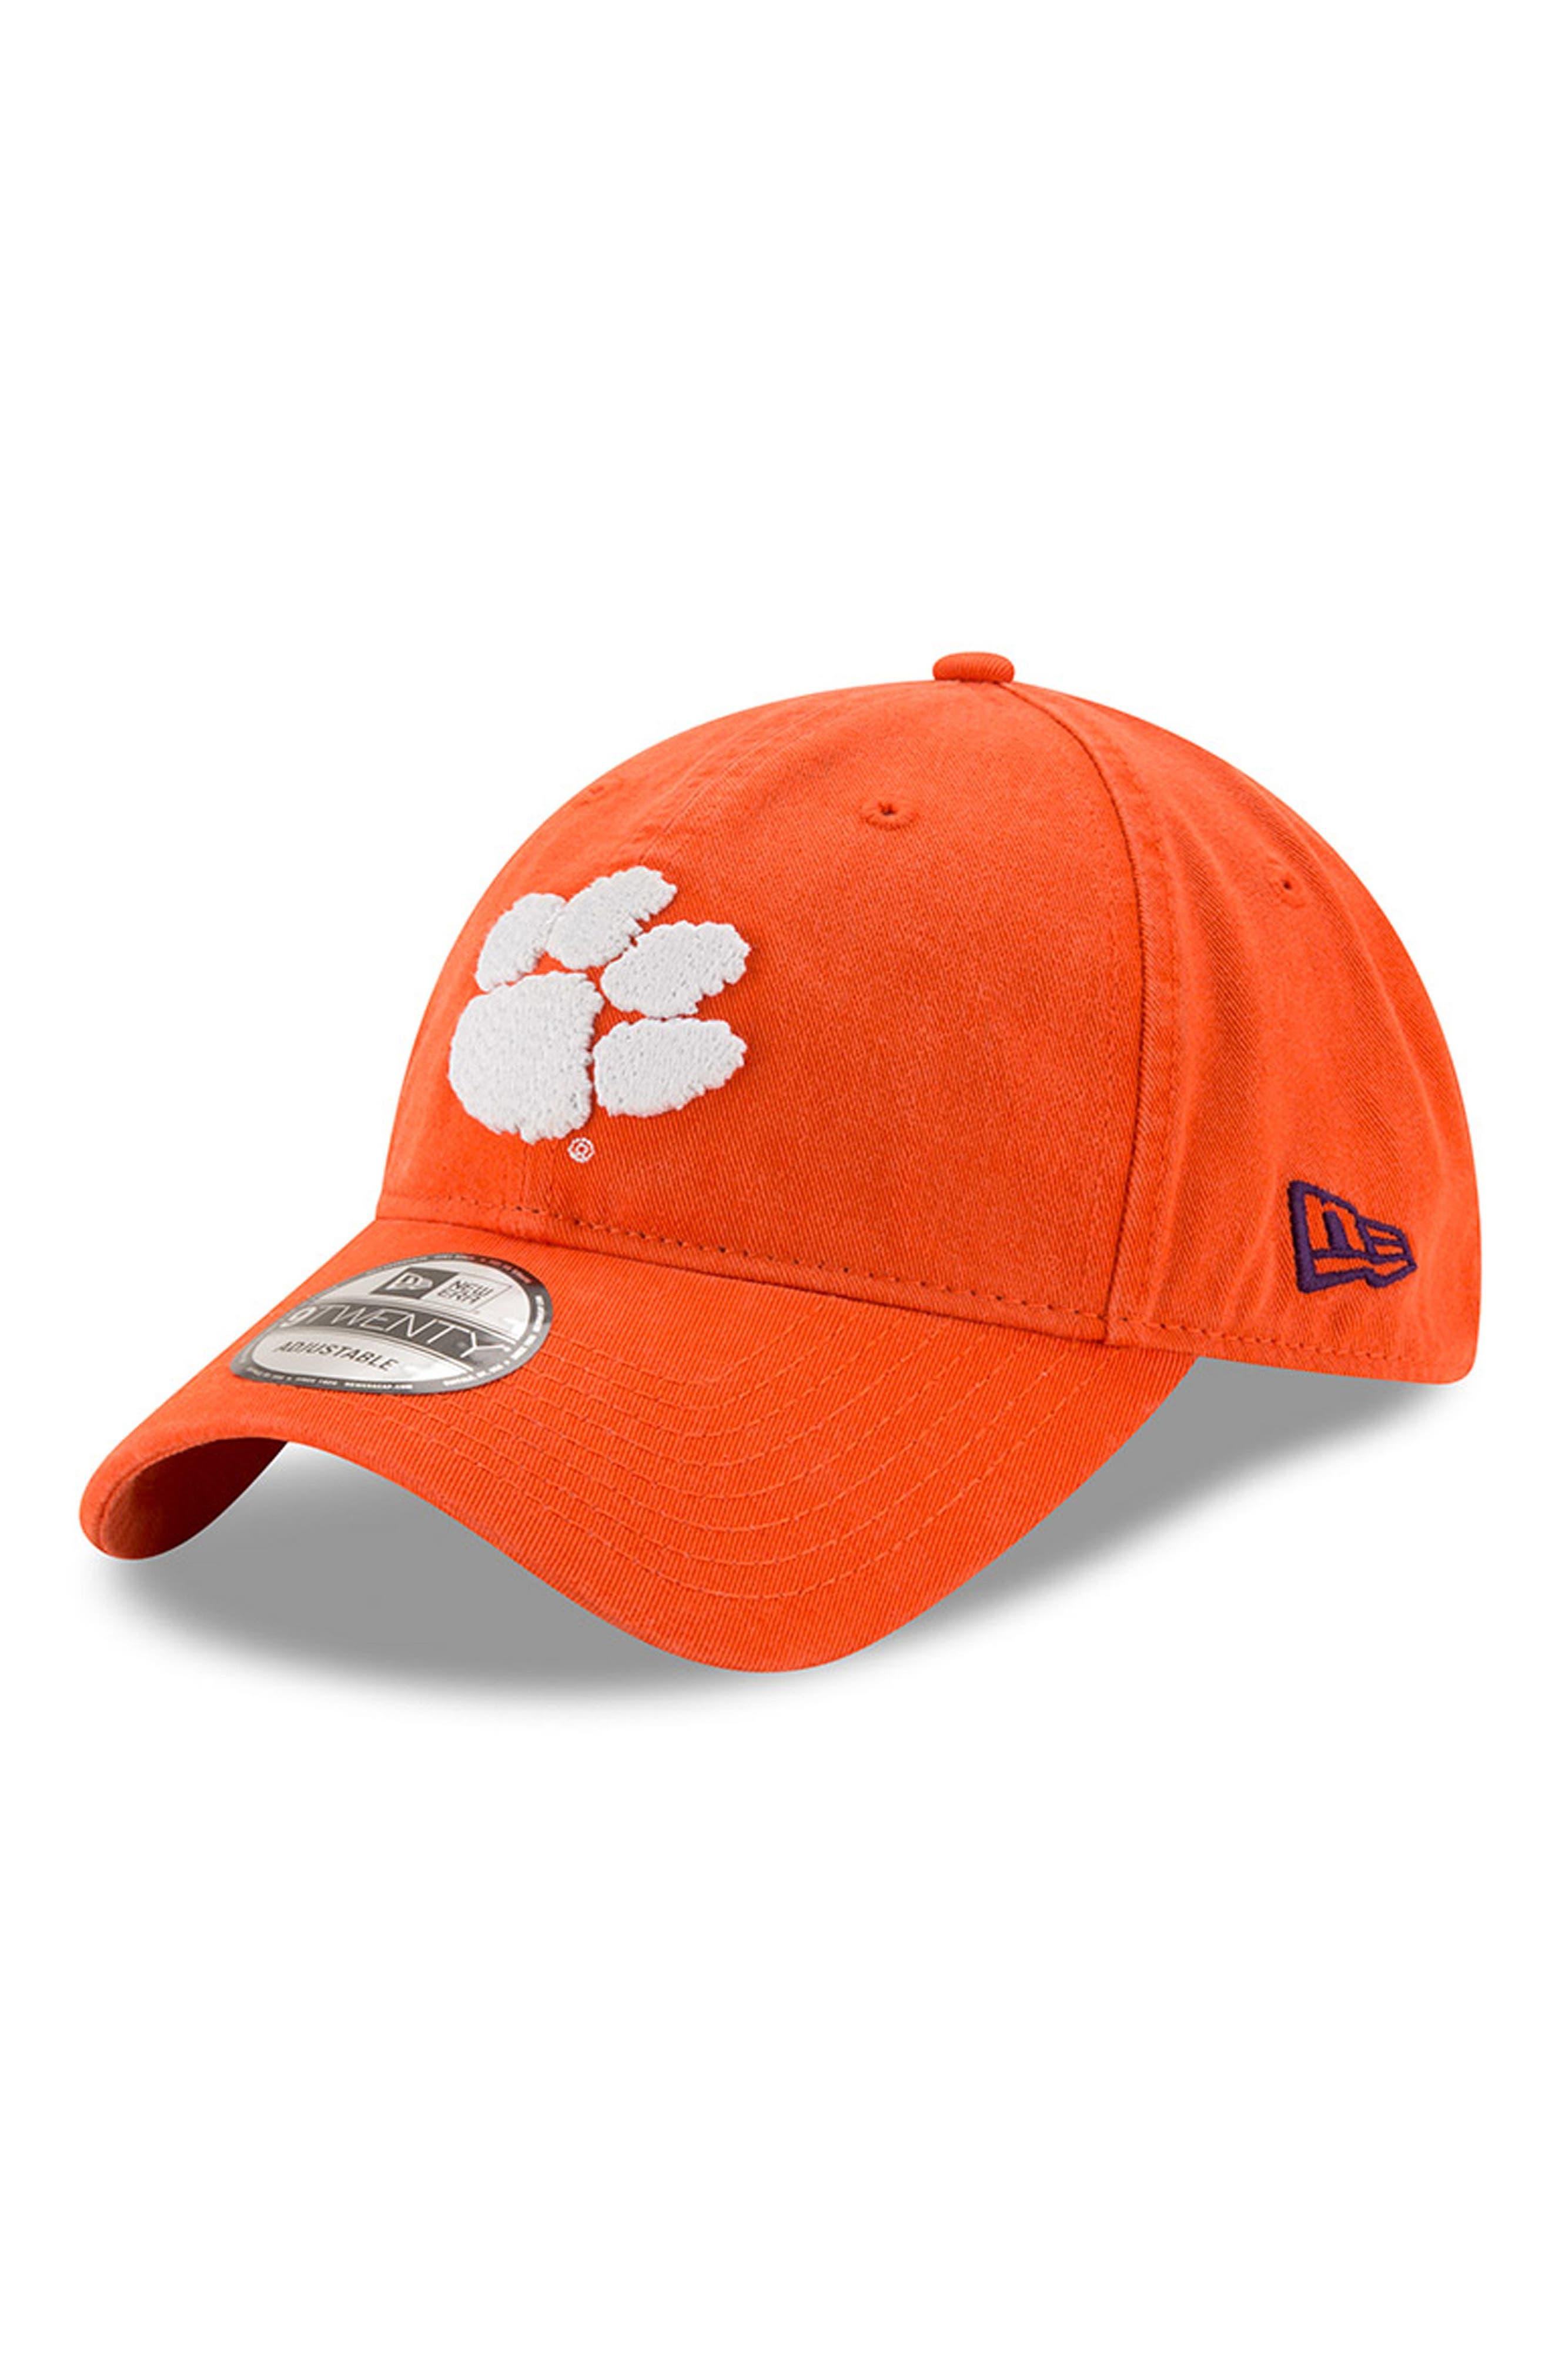 Alternate Image 1 Selected - New Era Collegiate Core Classic - Clemson Tigers Baseball Cap